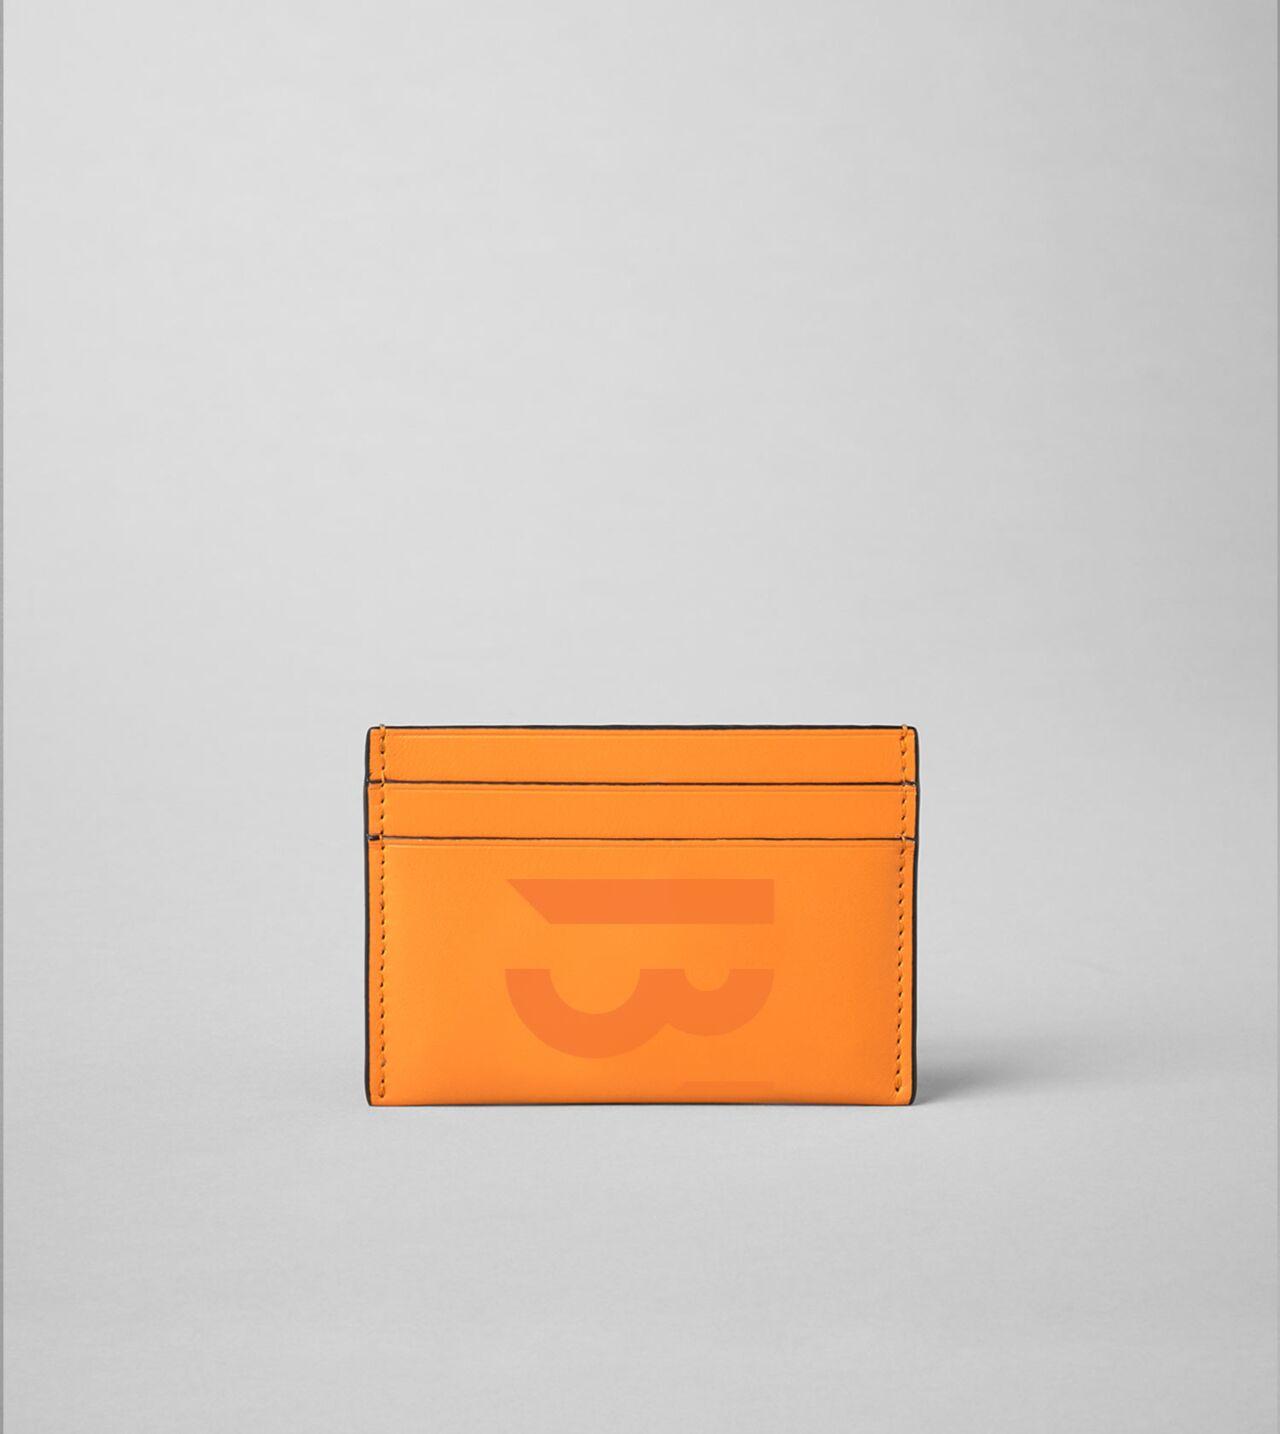 Picture of Byredo Credit card holder in Orange